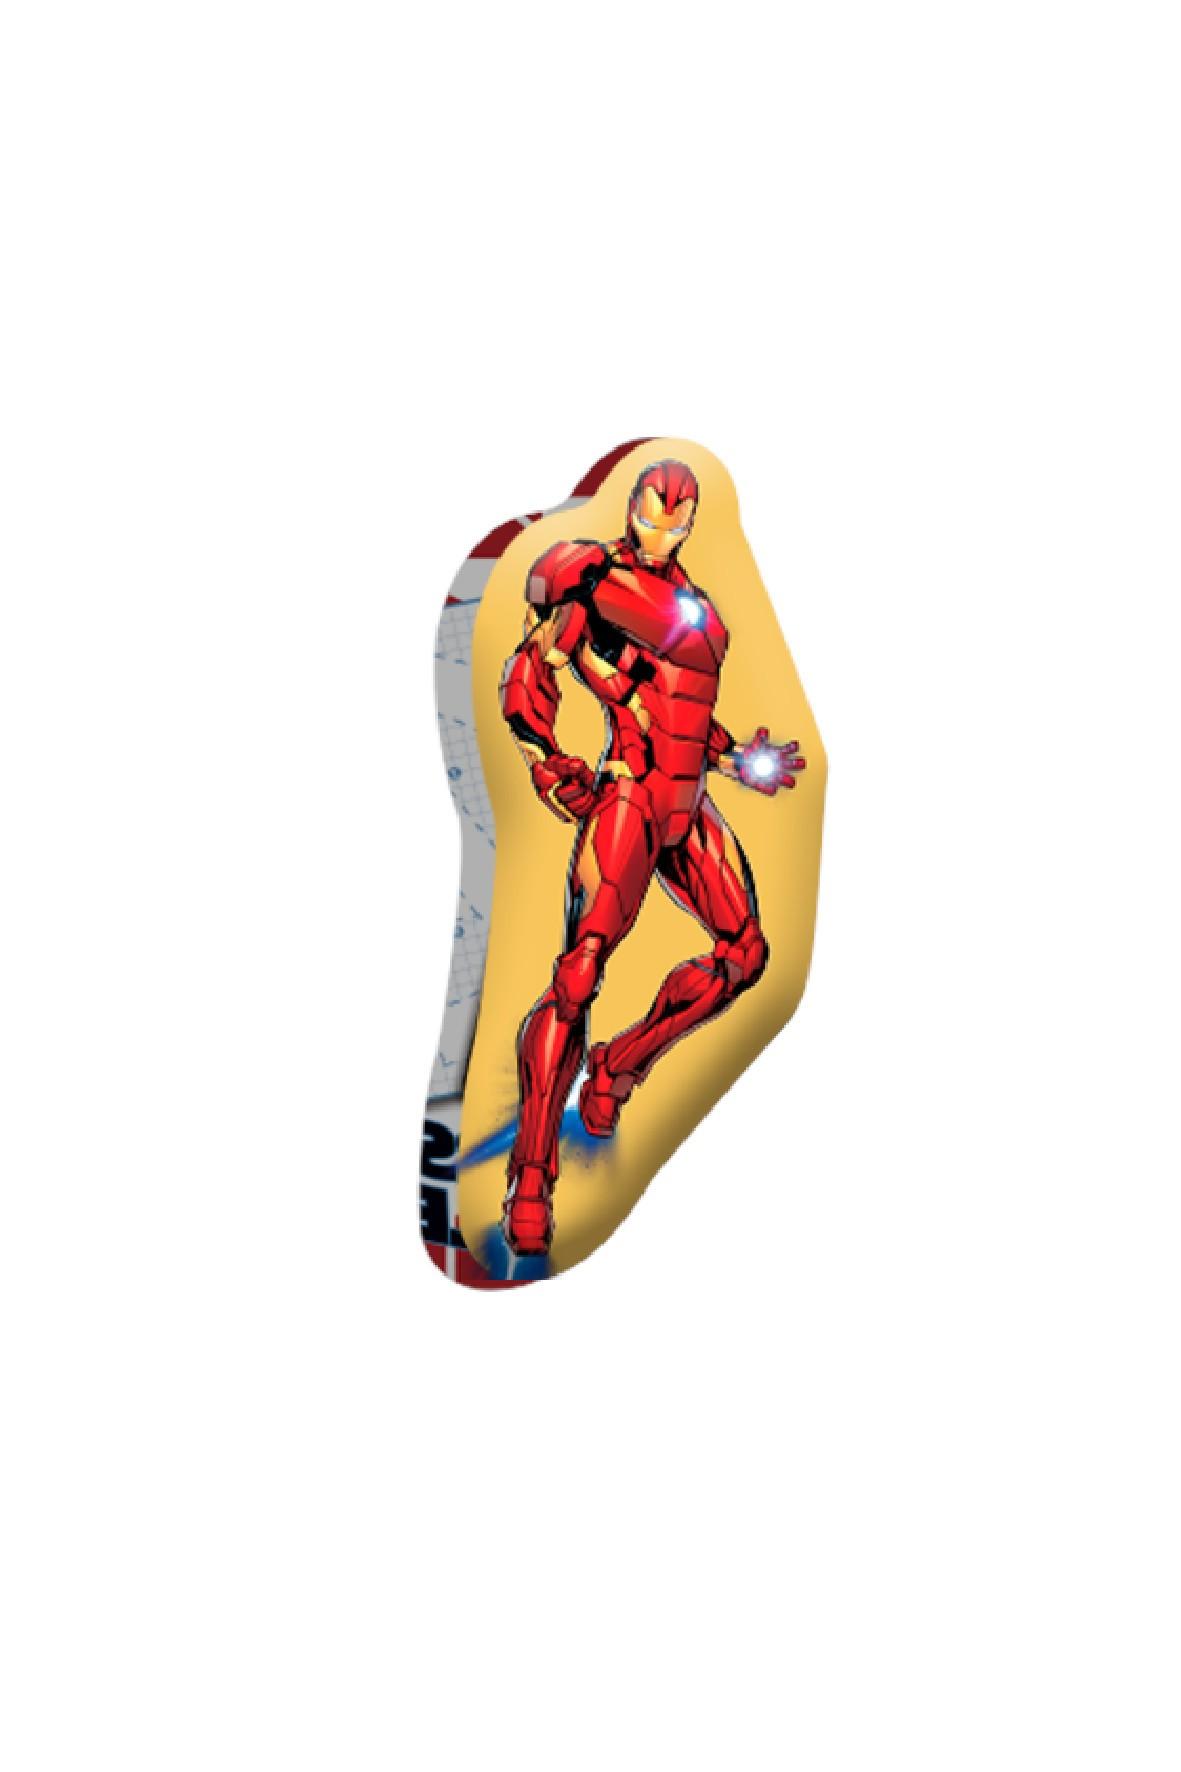 Avengers Poduszka Iron man mini 10x10 cm